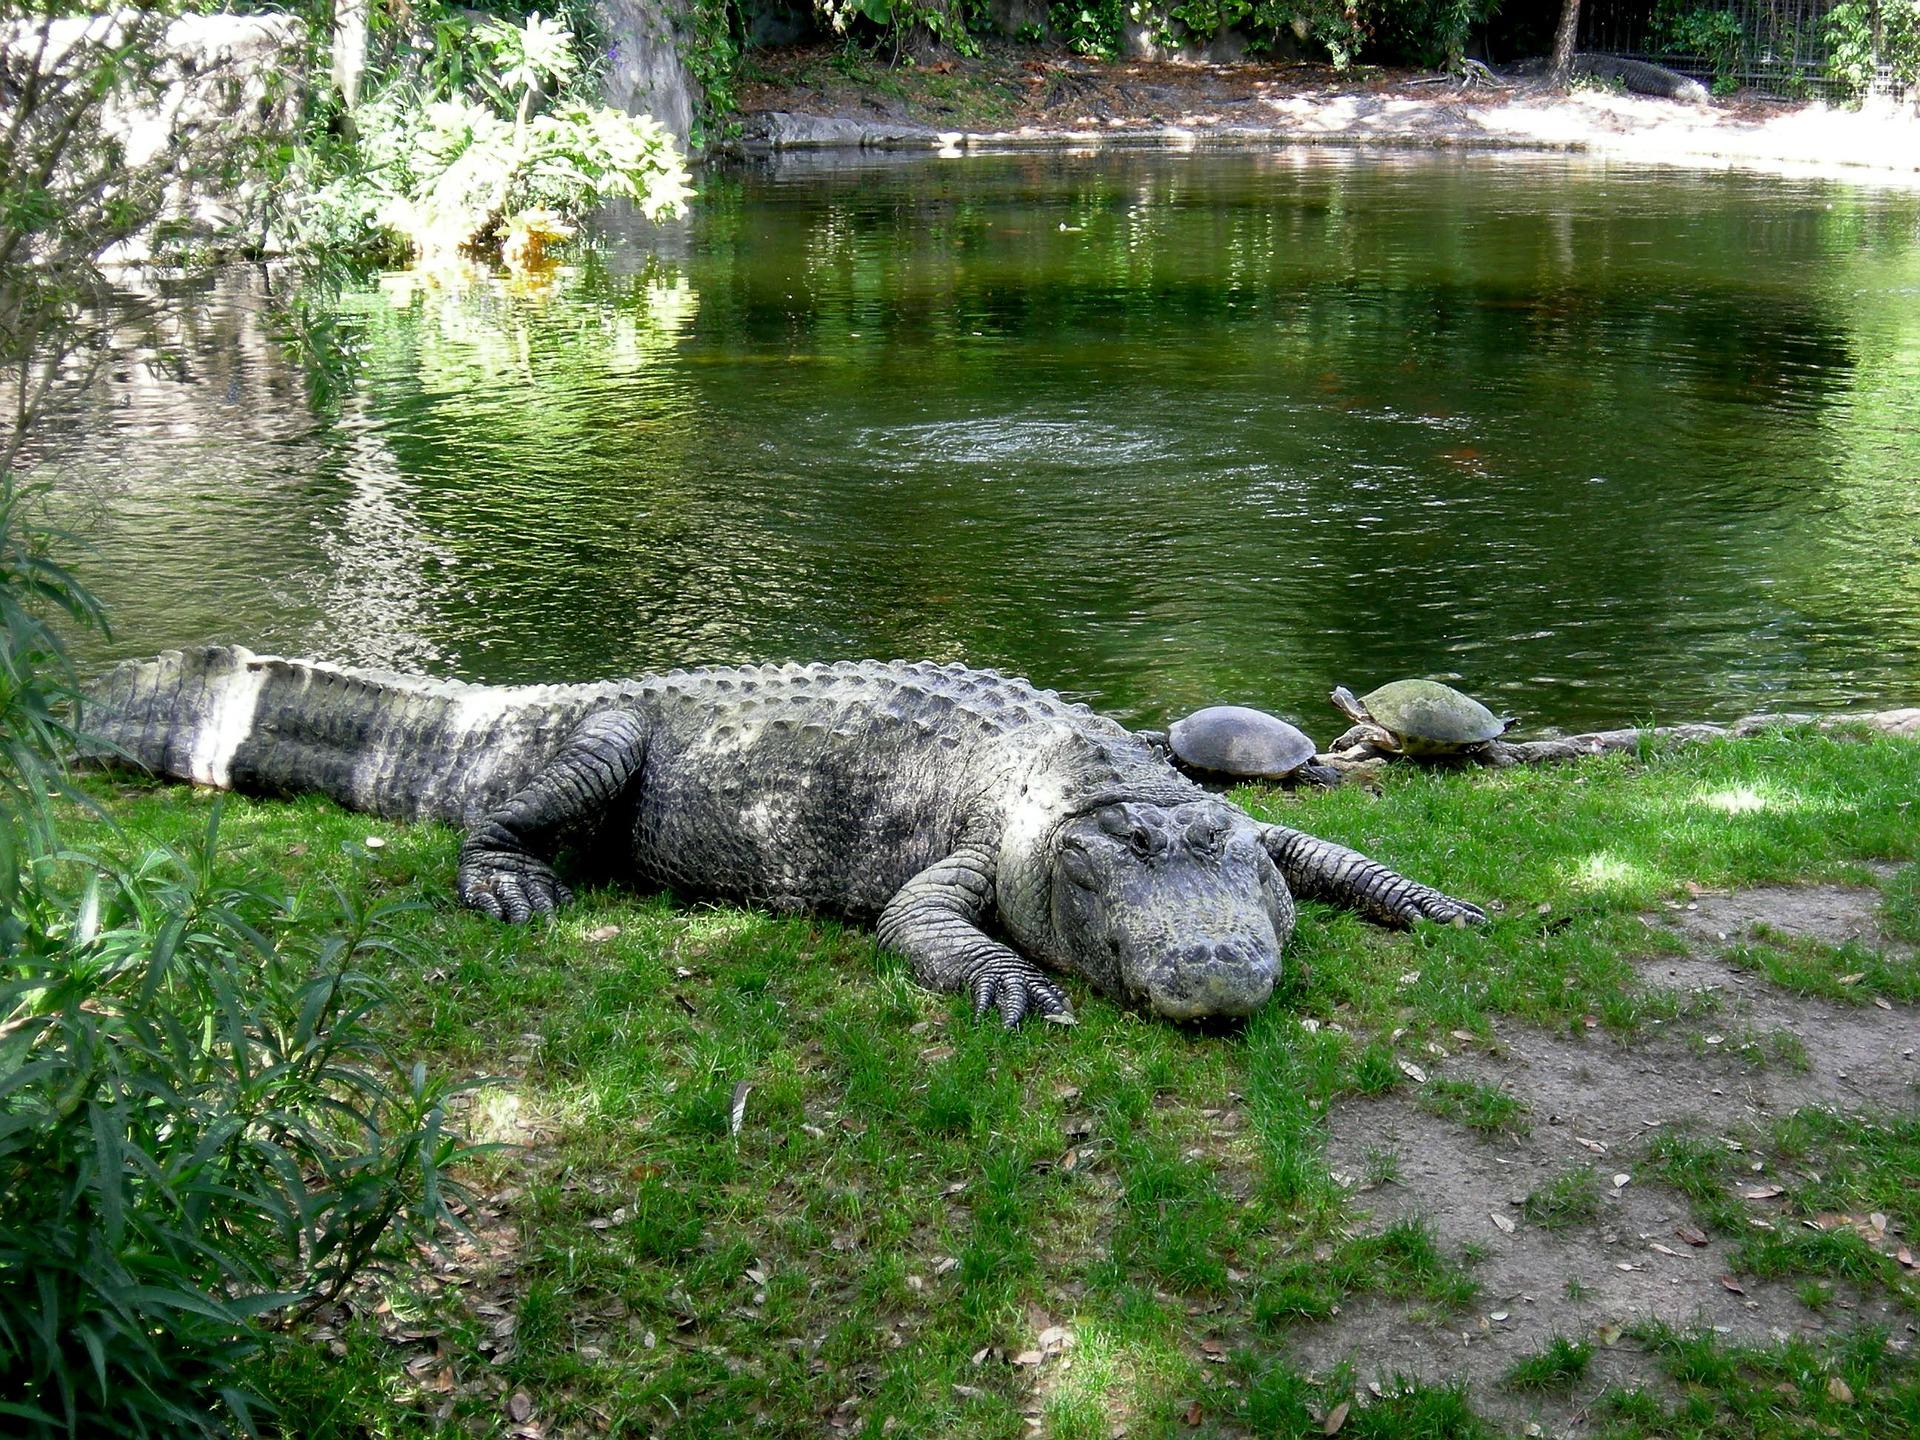 aligator-202383_1920